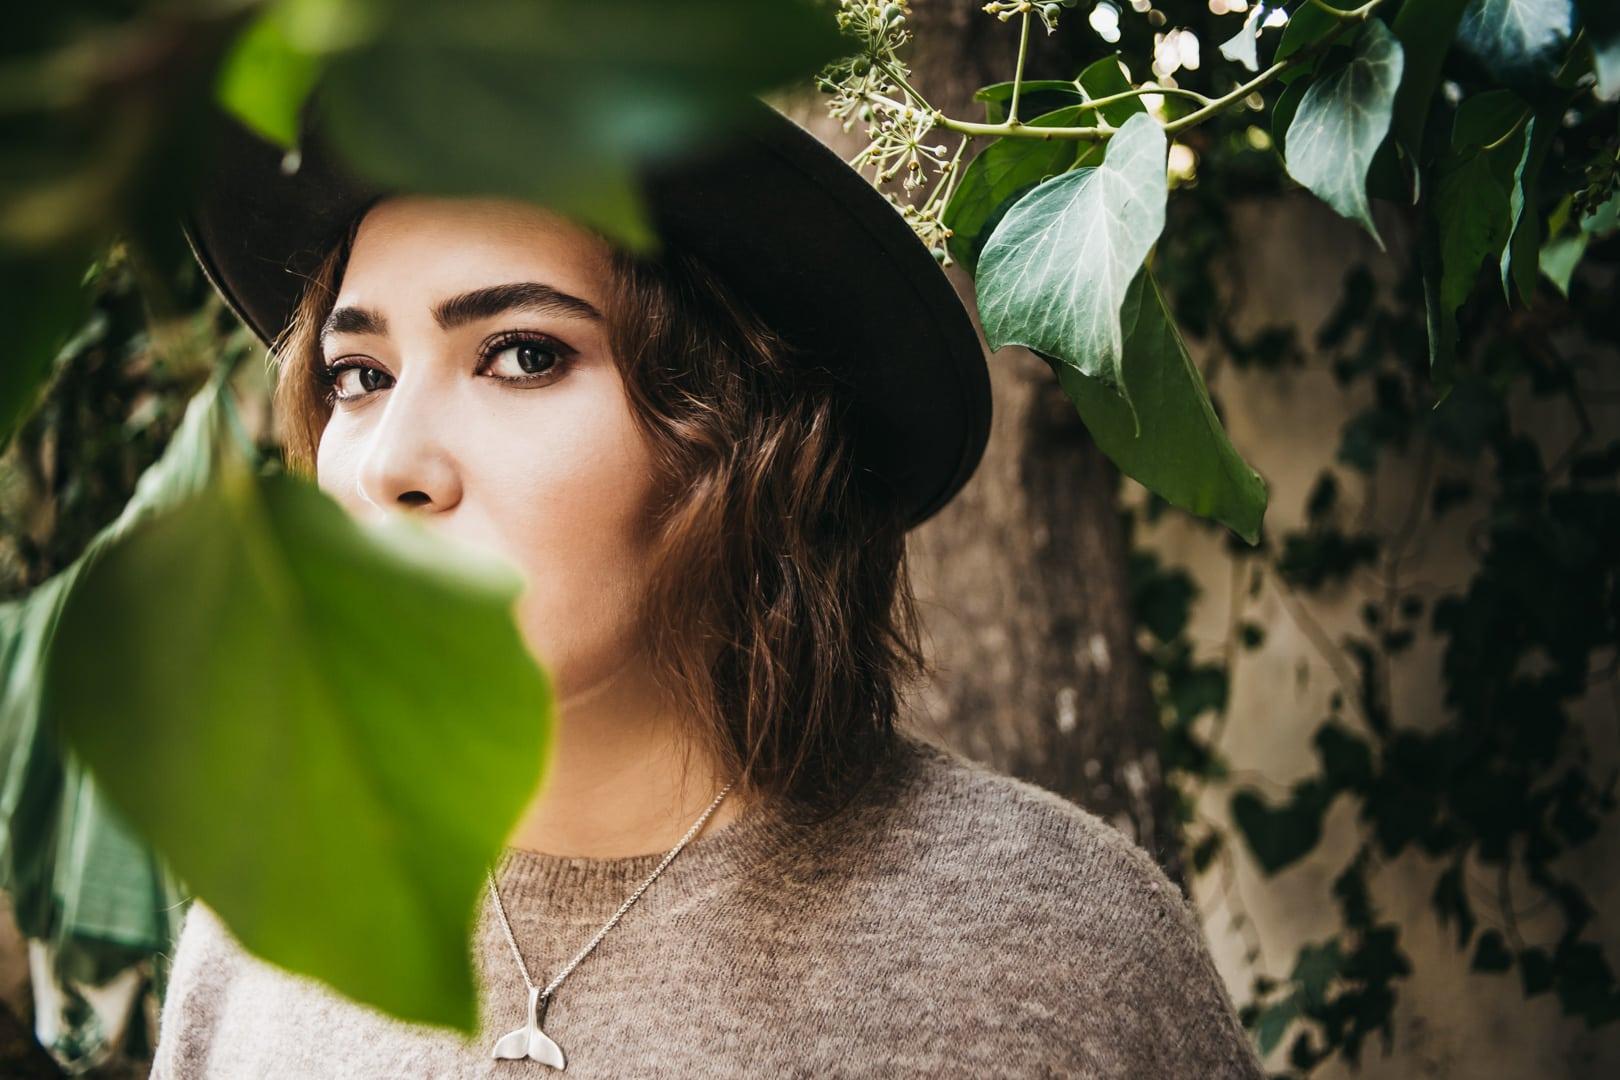 algarve portugal portrait photo. girl with hat hiding behind a leaf